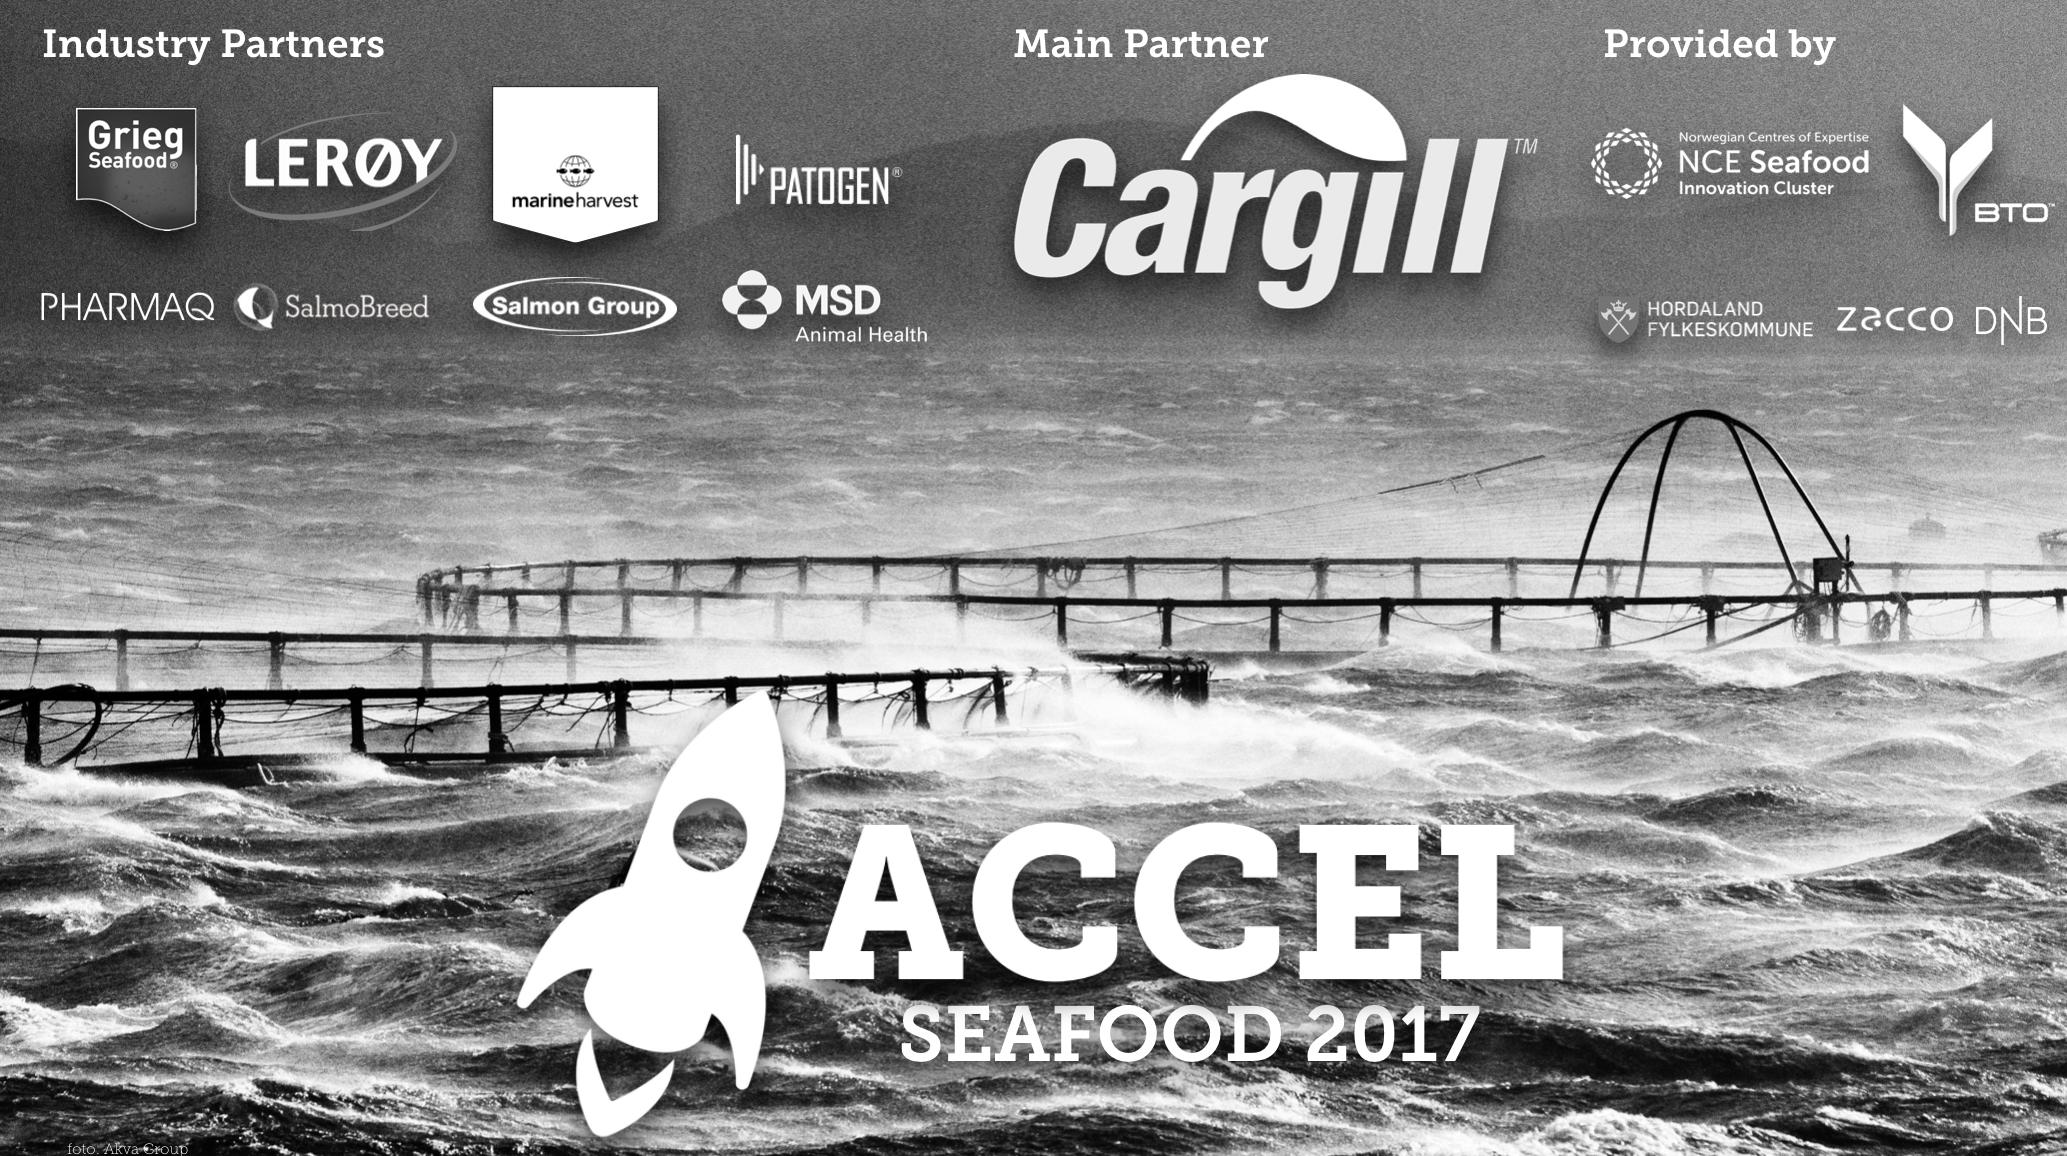 ACCEL Seafood 2017 Poster v4.png